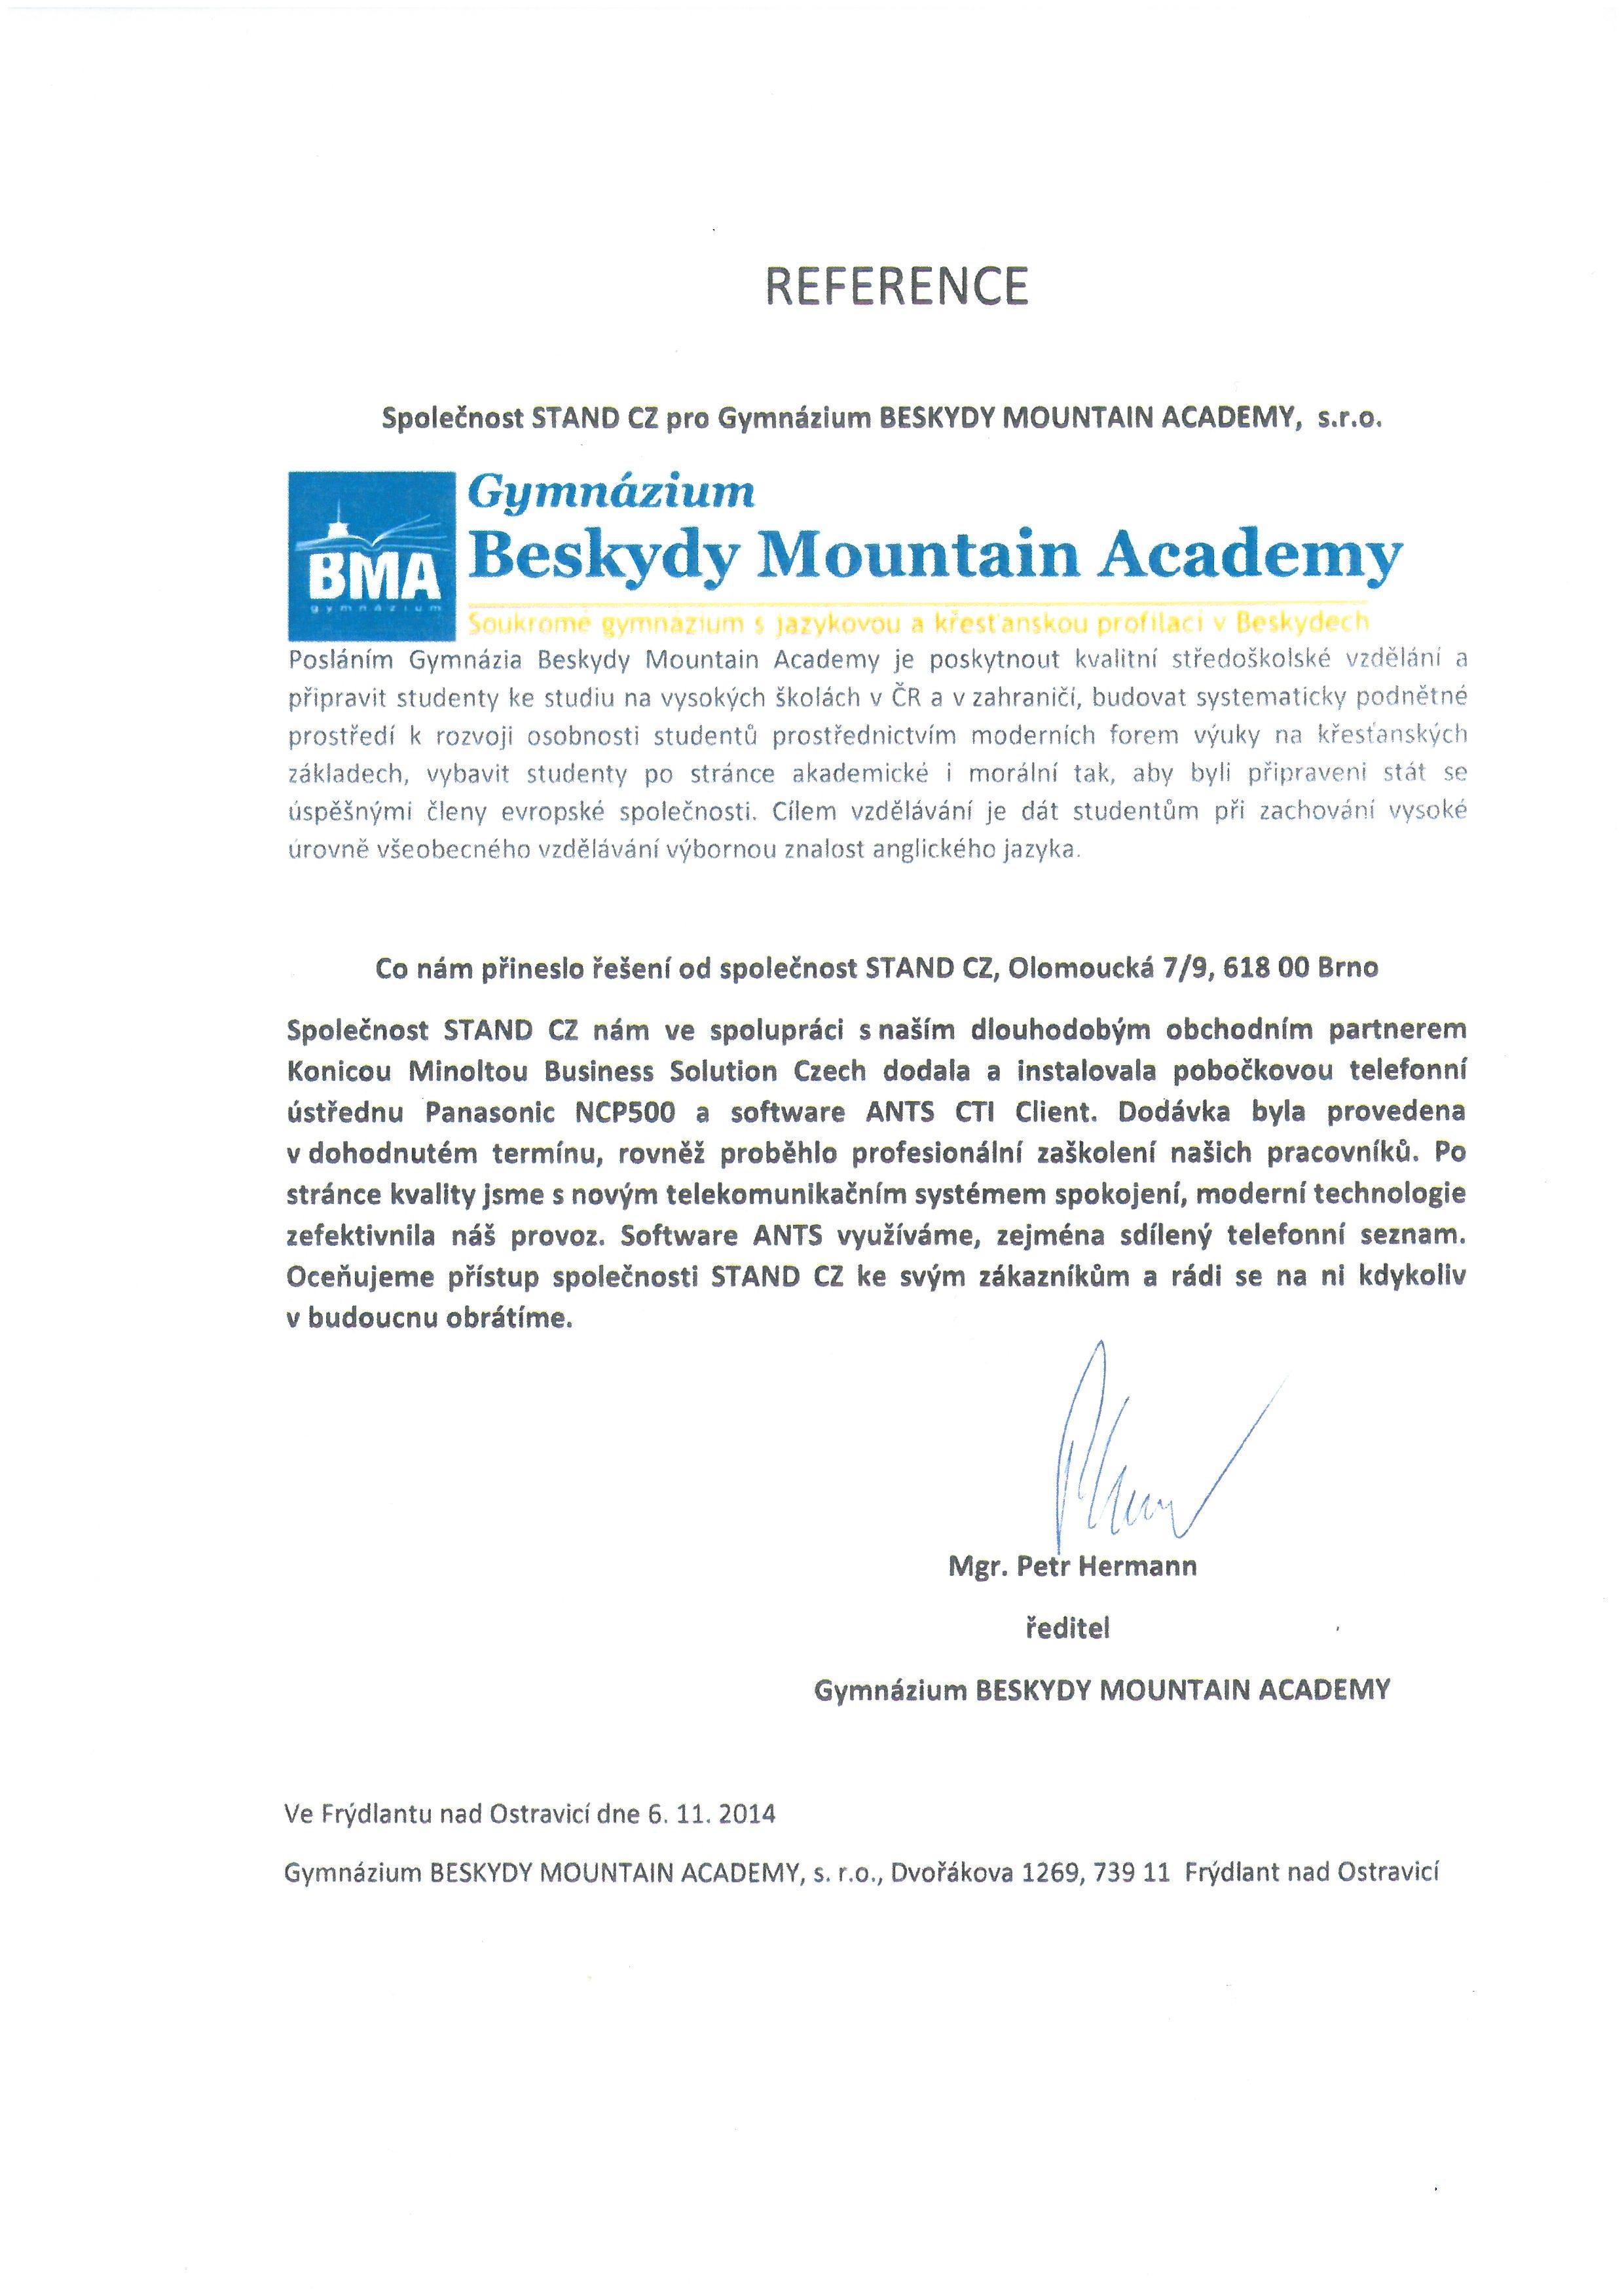 Gymnázium Beskydy Mountain Academy